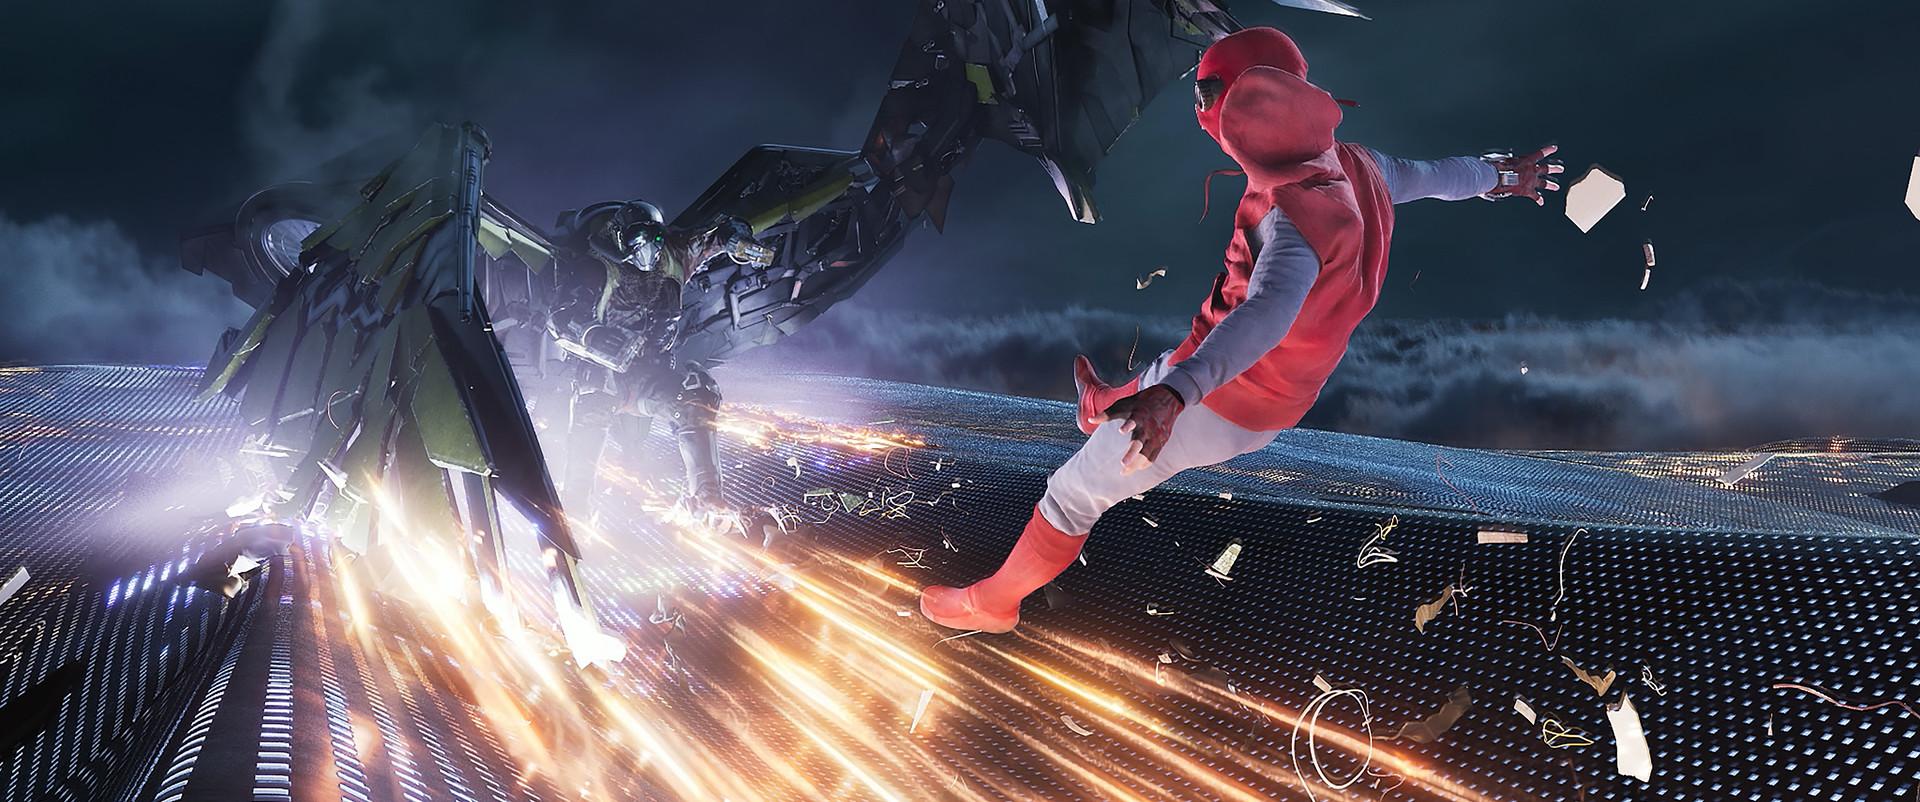 James chan spi spiderman homecoming vfx 015 1